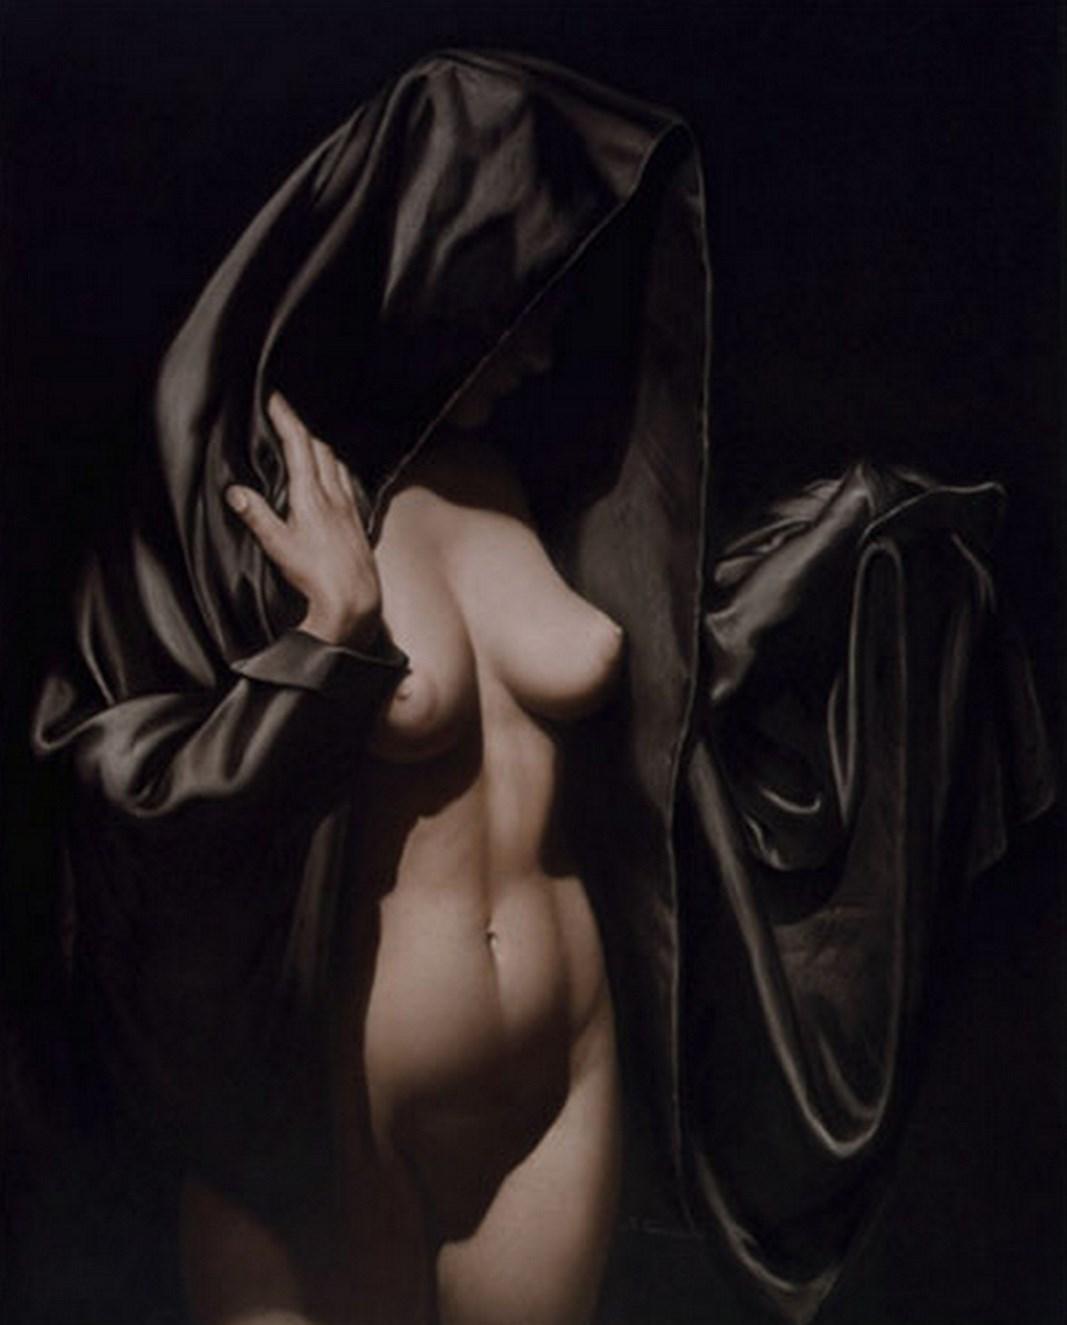 Pintura Art Stica Hiperrealista Cuadrosde Mujeres Desnudas Al Leo